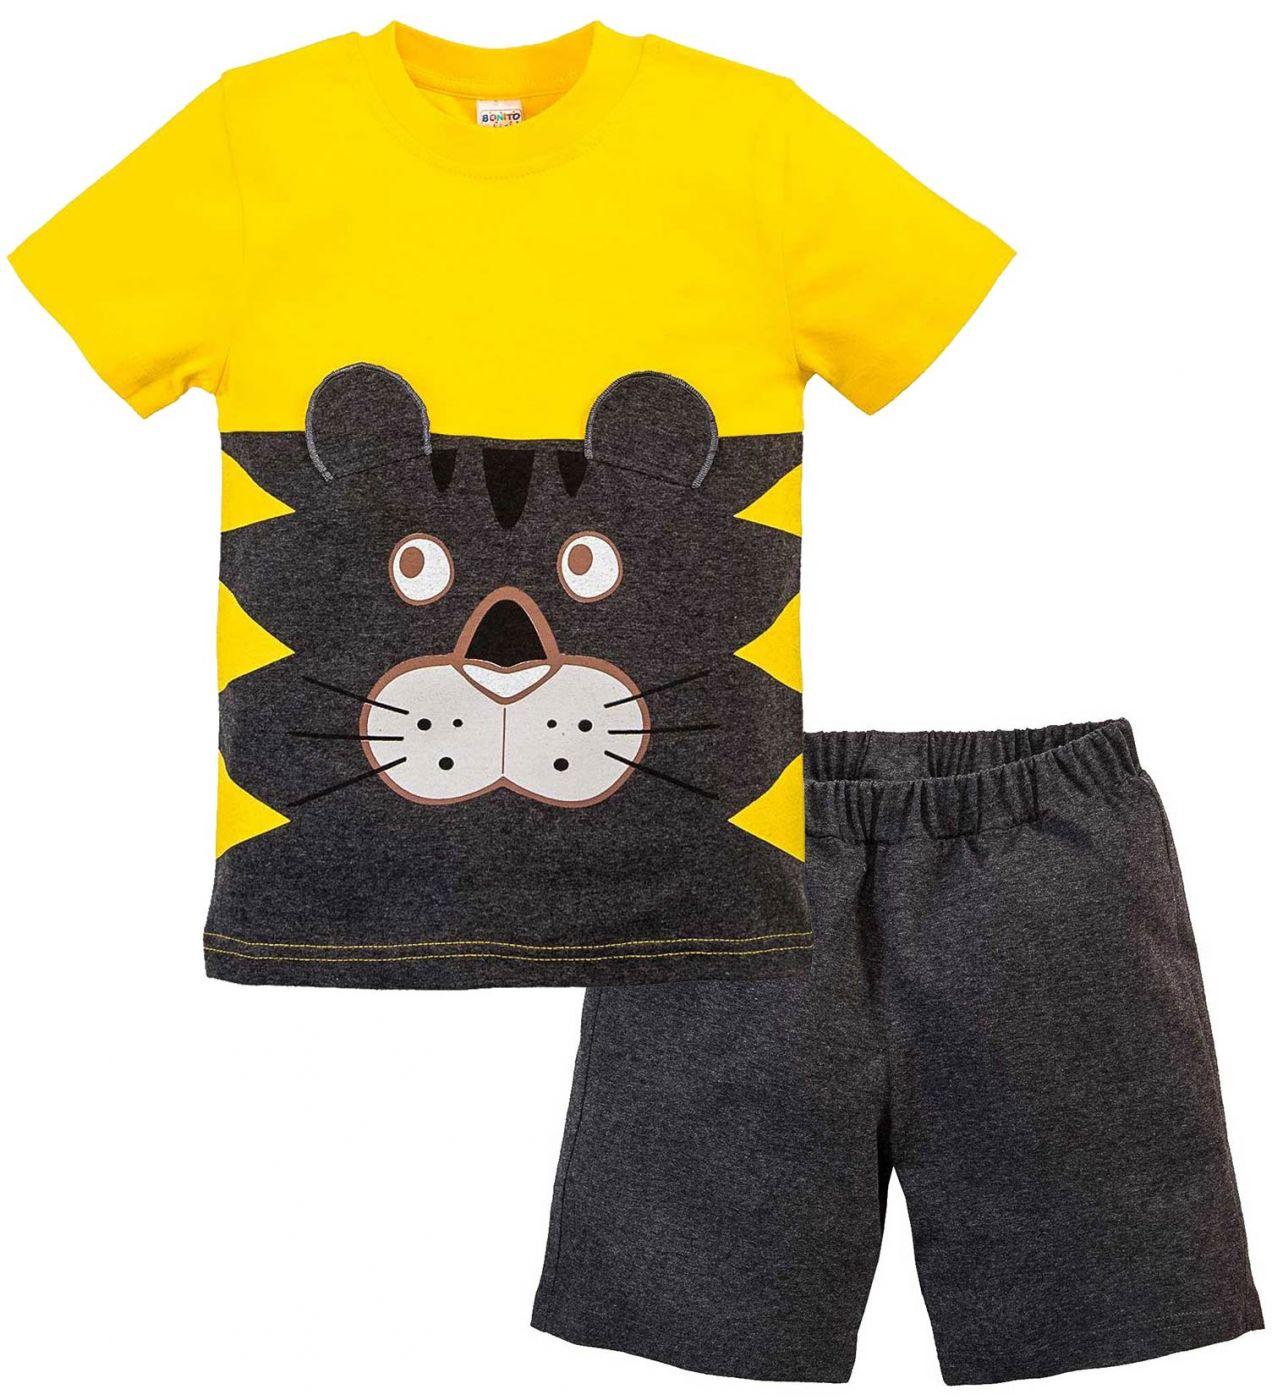 Костюм для мальчика Bonito желтый с мордочкой тигра